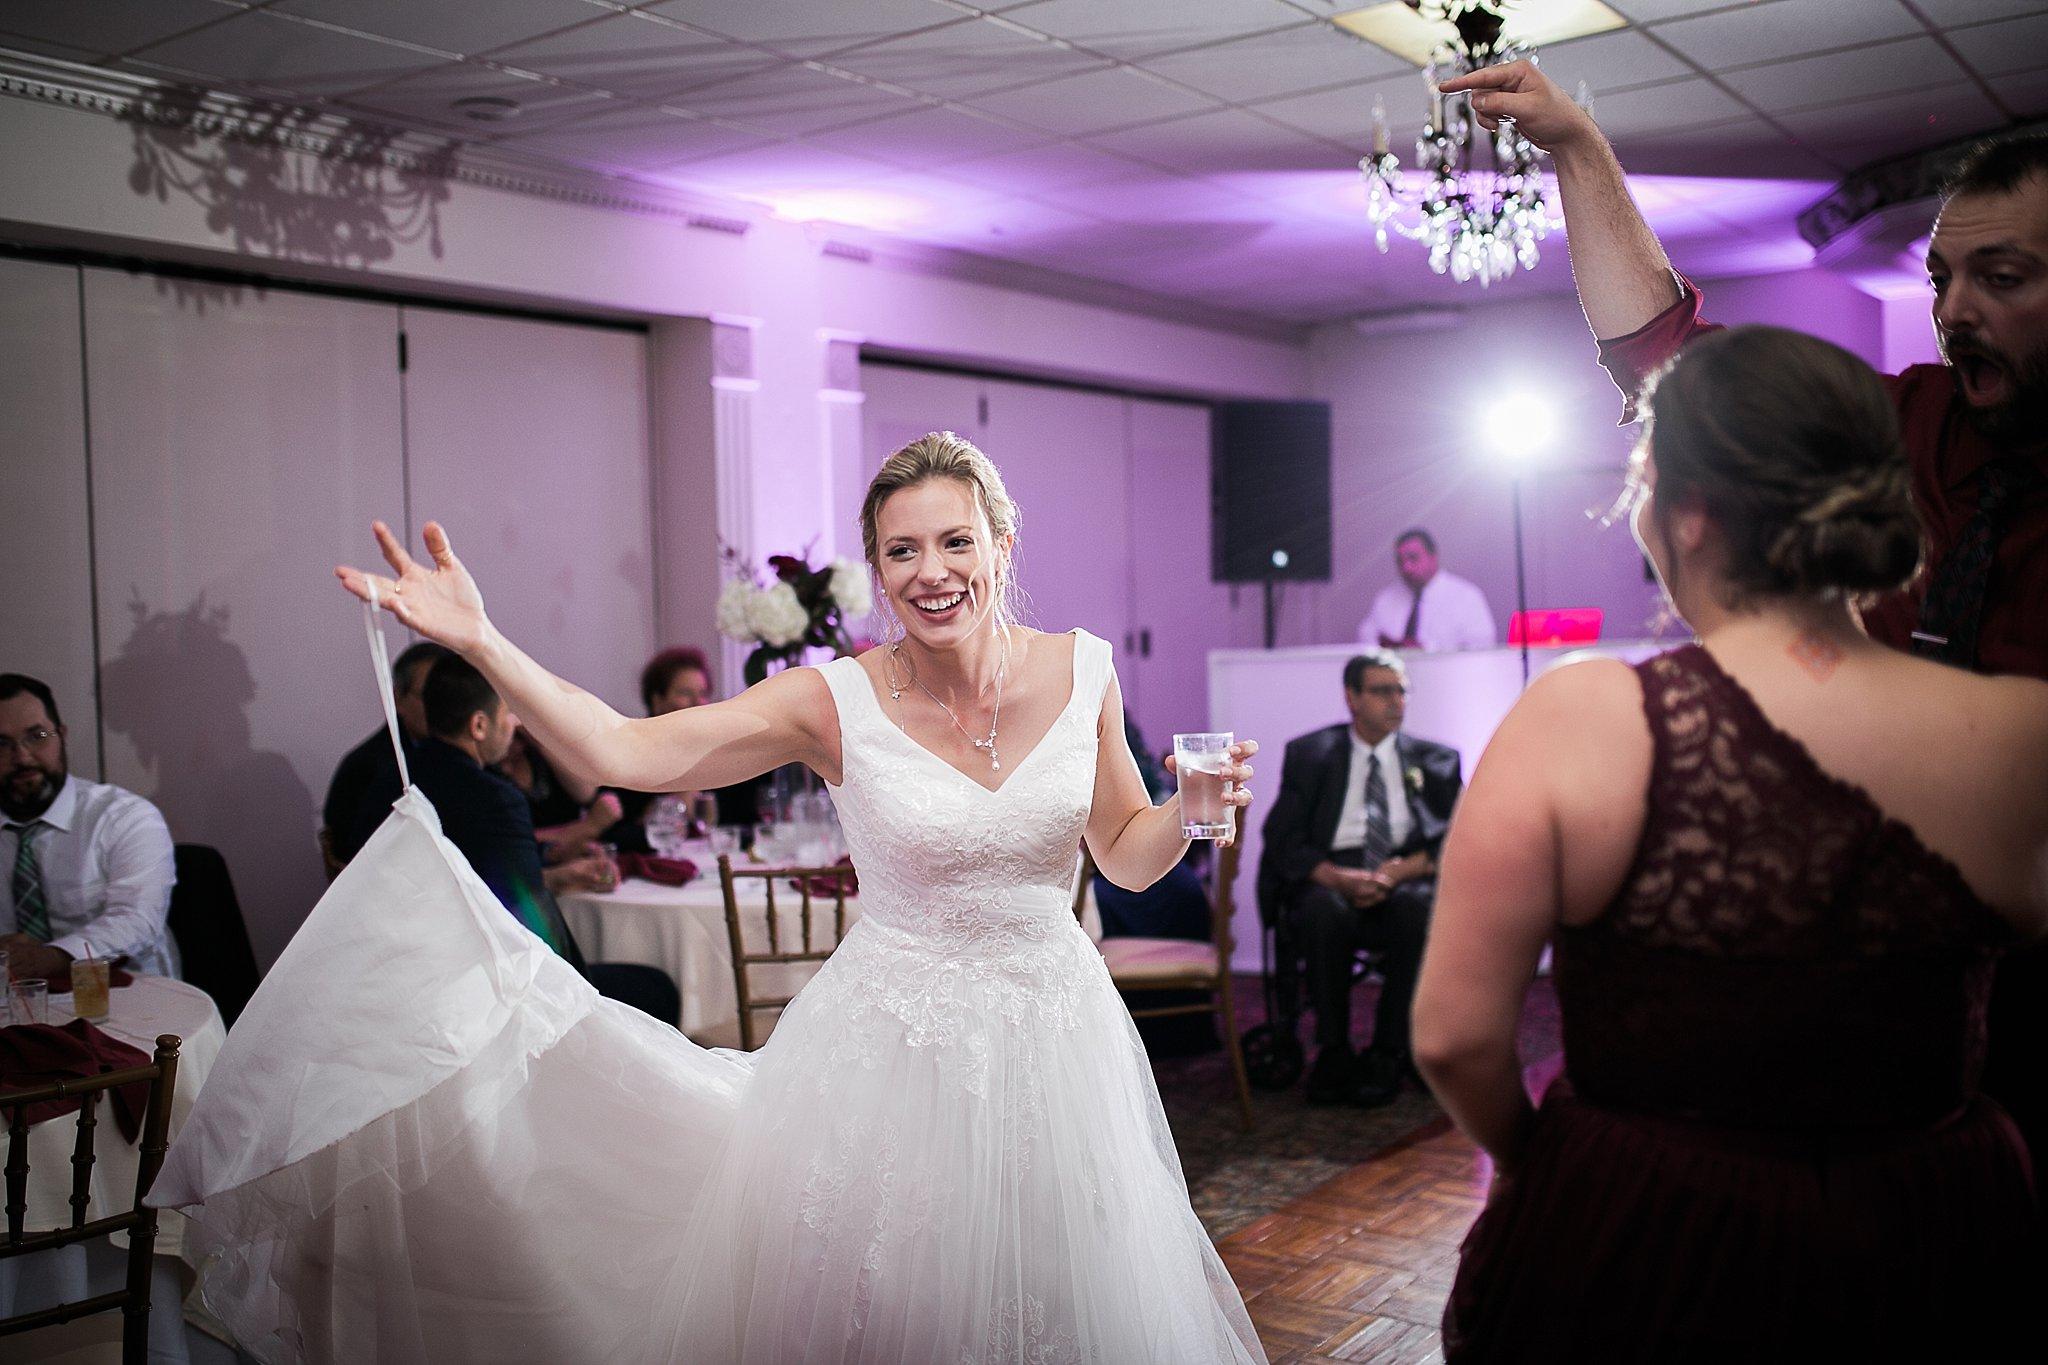 New Windsor New York Hudson Valley New York Wedding Photographer 72.jpg